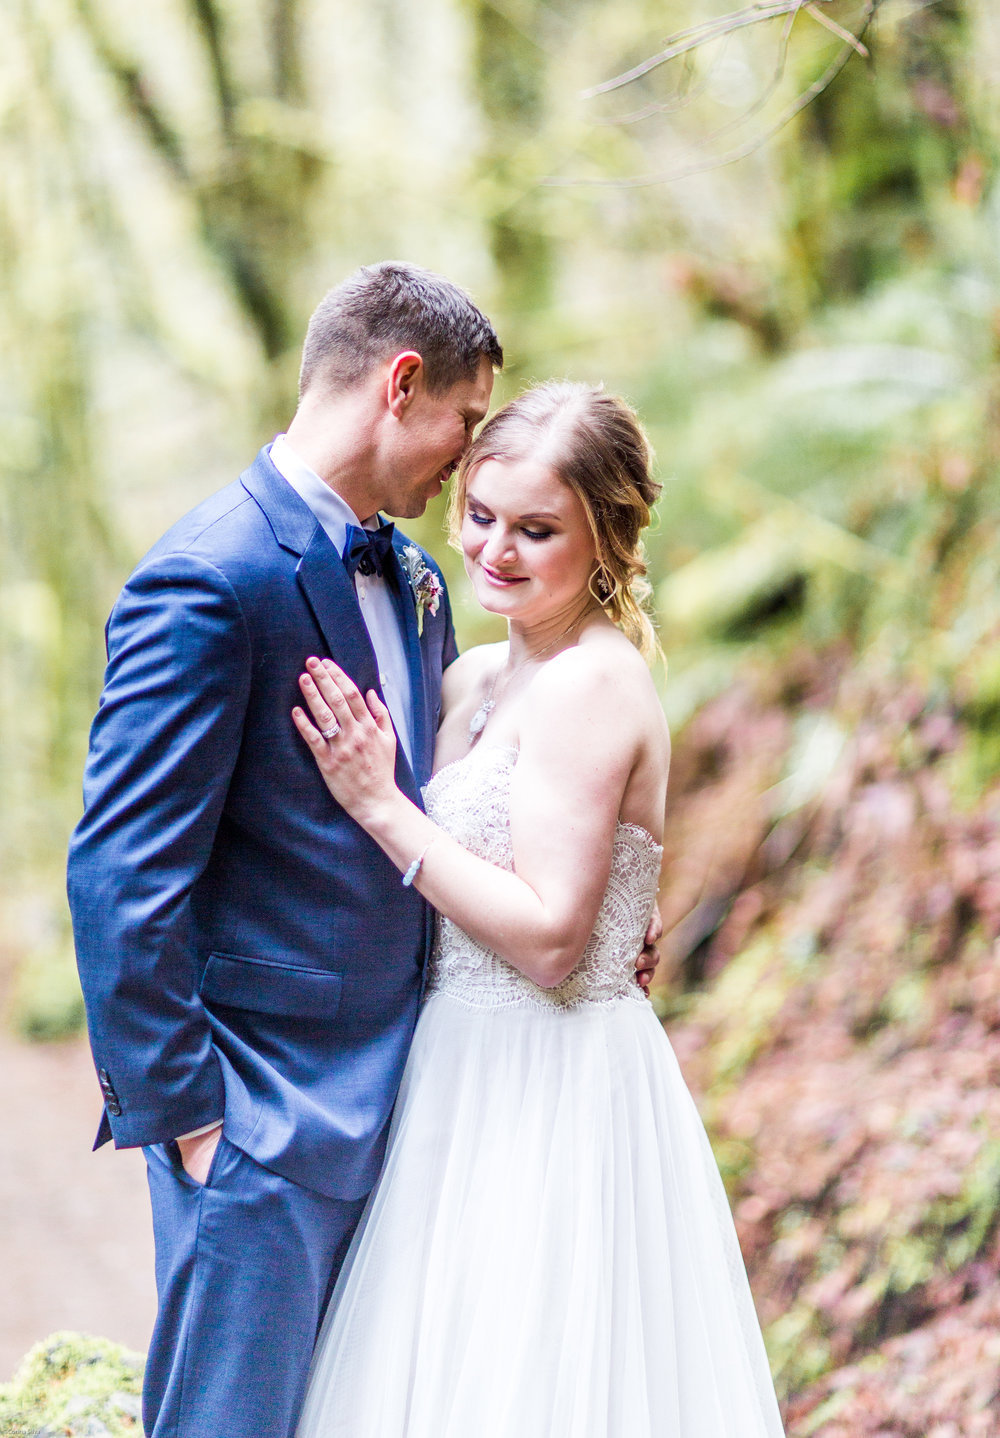 Silver Falls-elopement-bride-and-groom-photo Corina Silva Studios-127.jpg